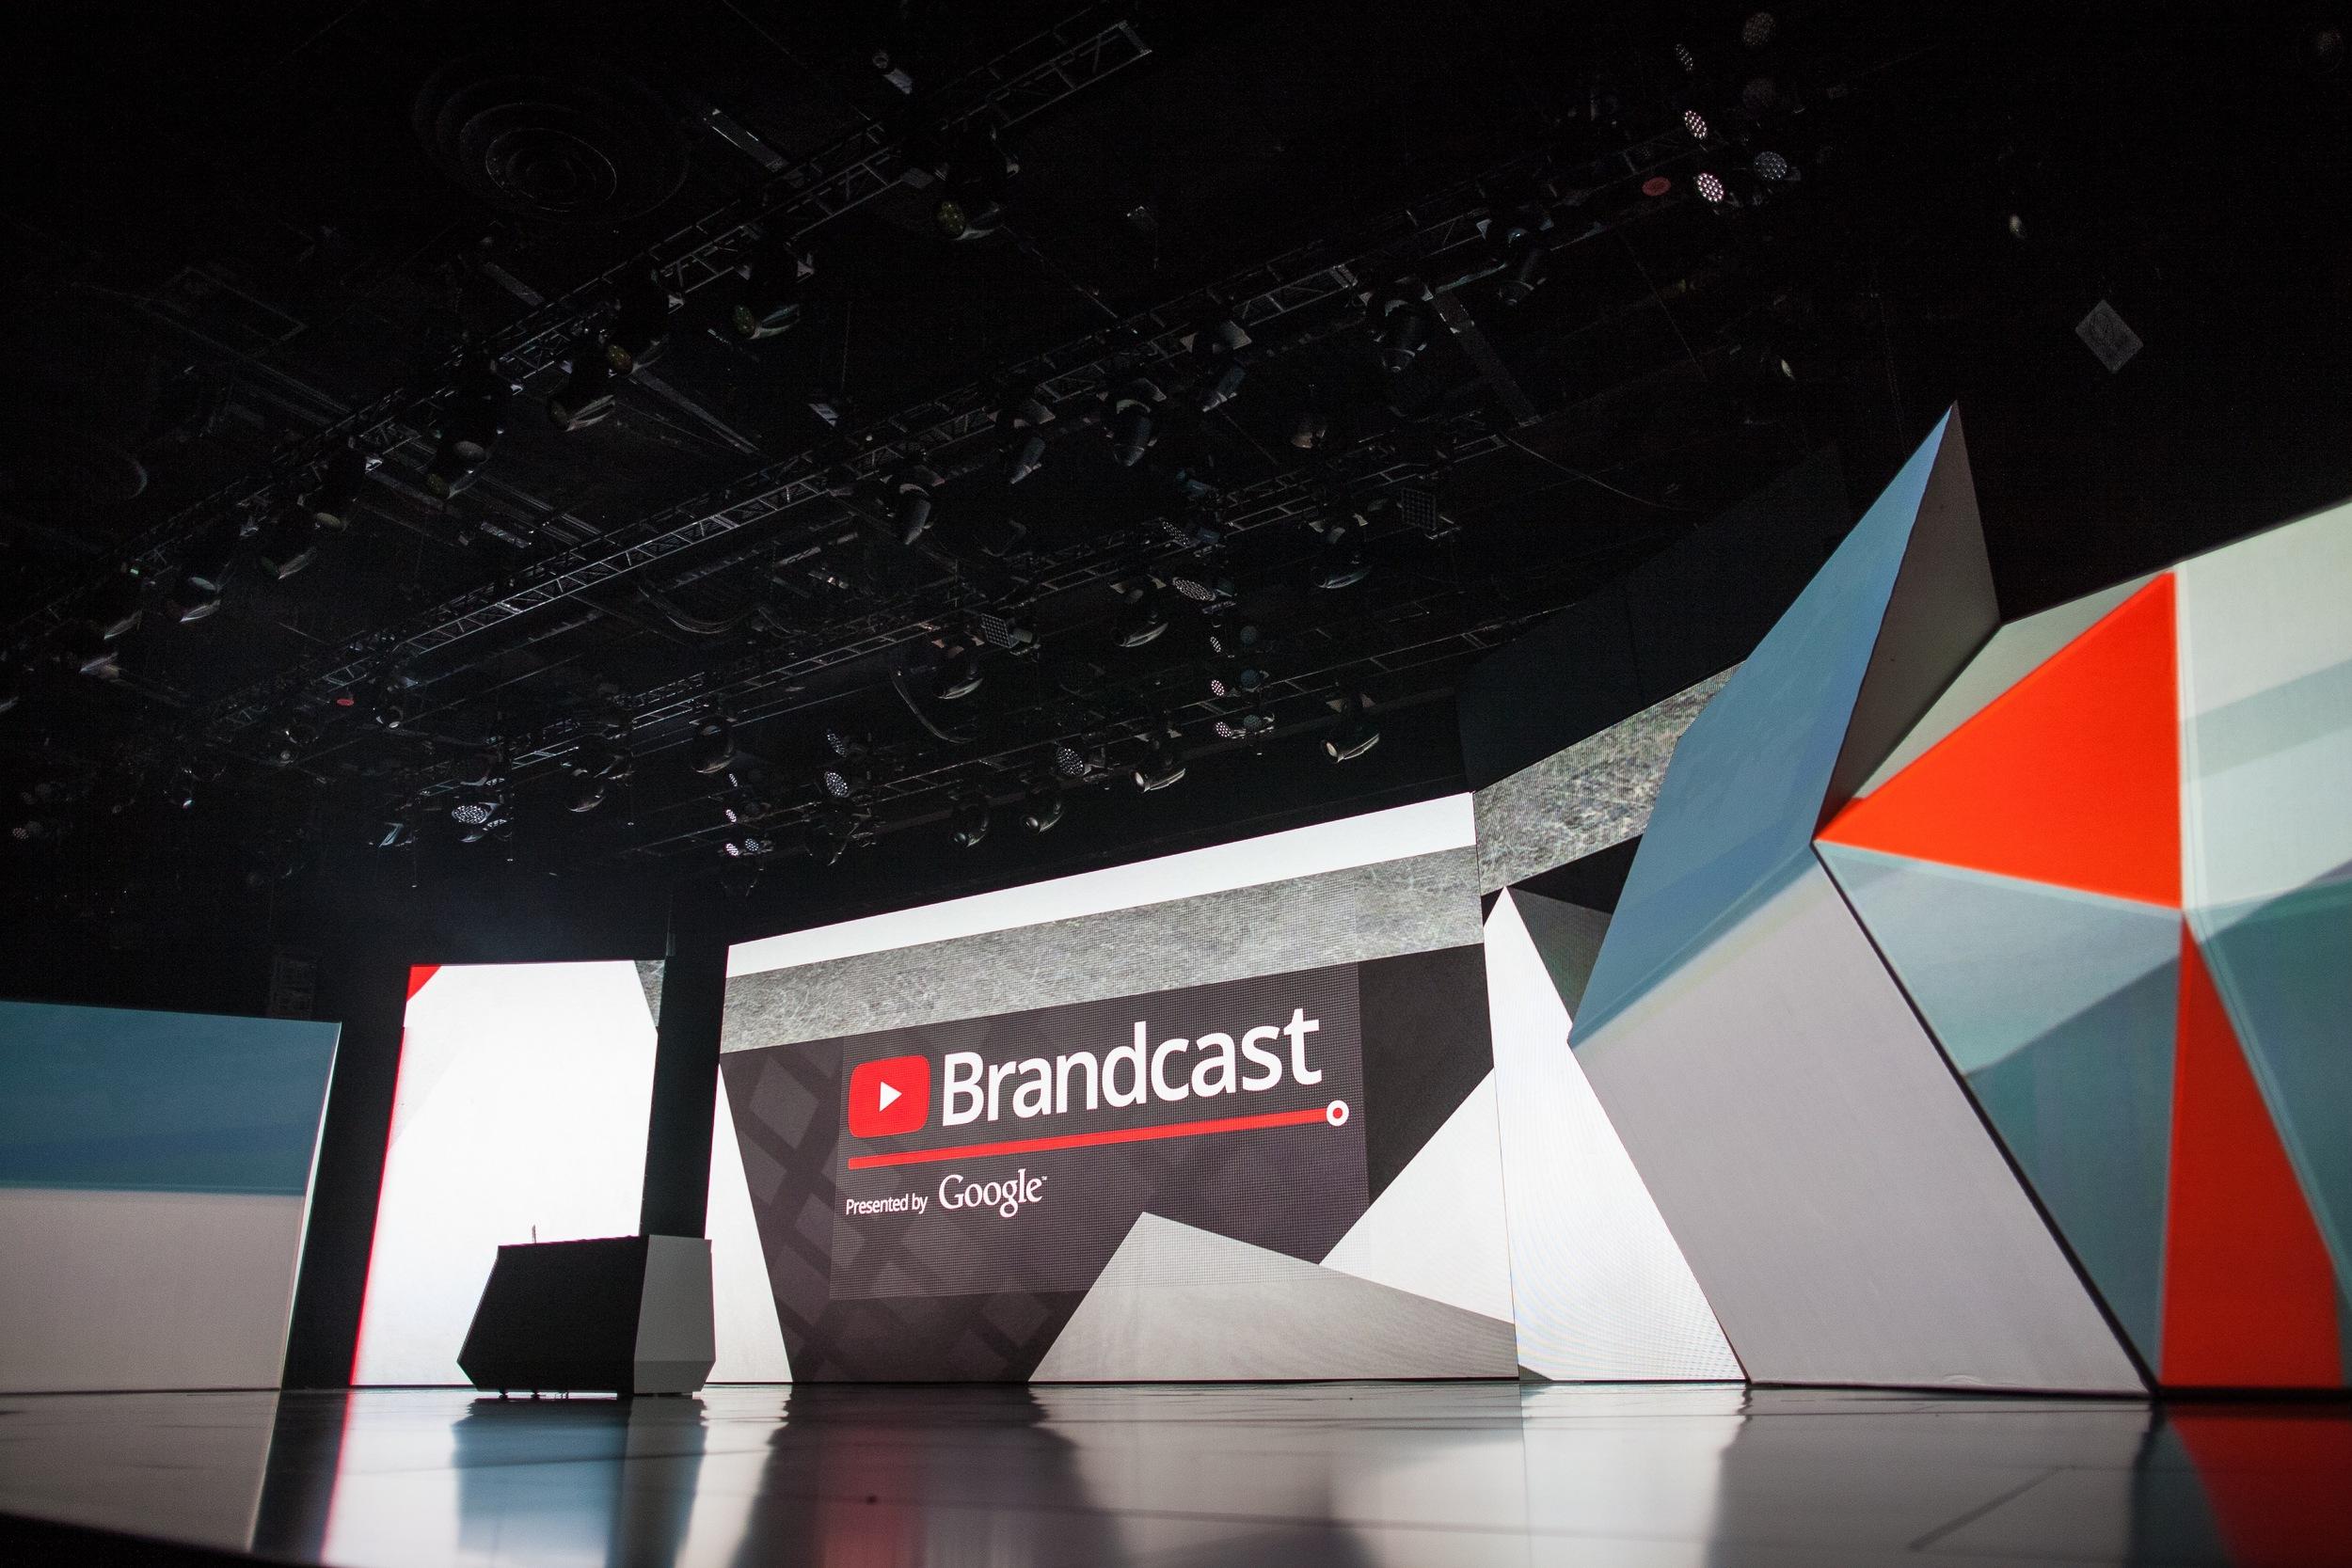 Brandcast2014 - 007.jpg   .jpg